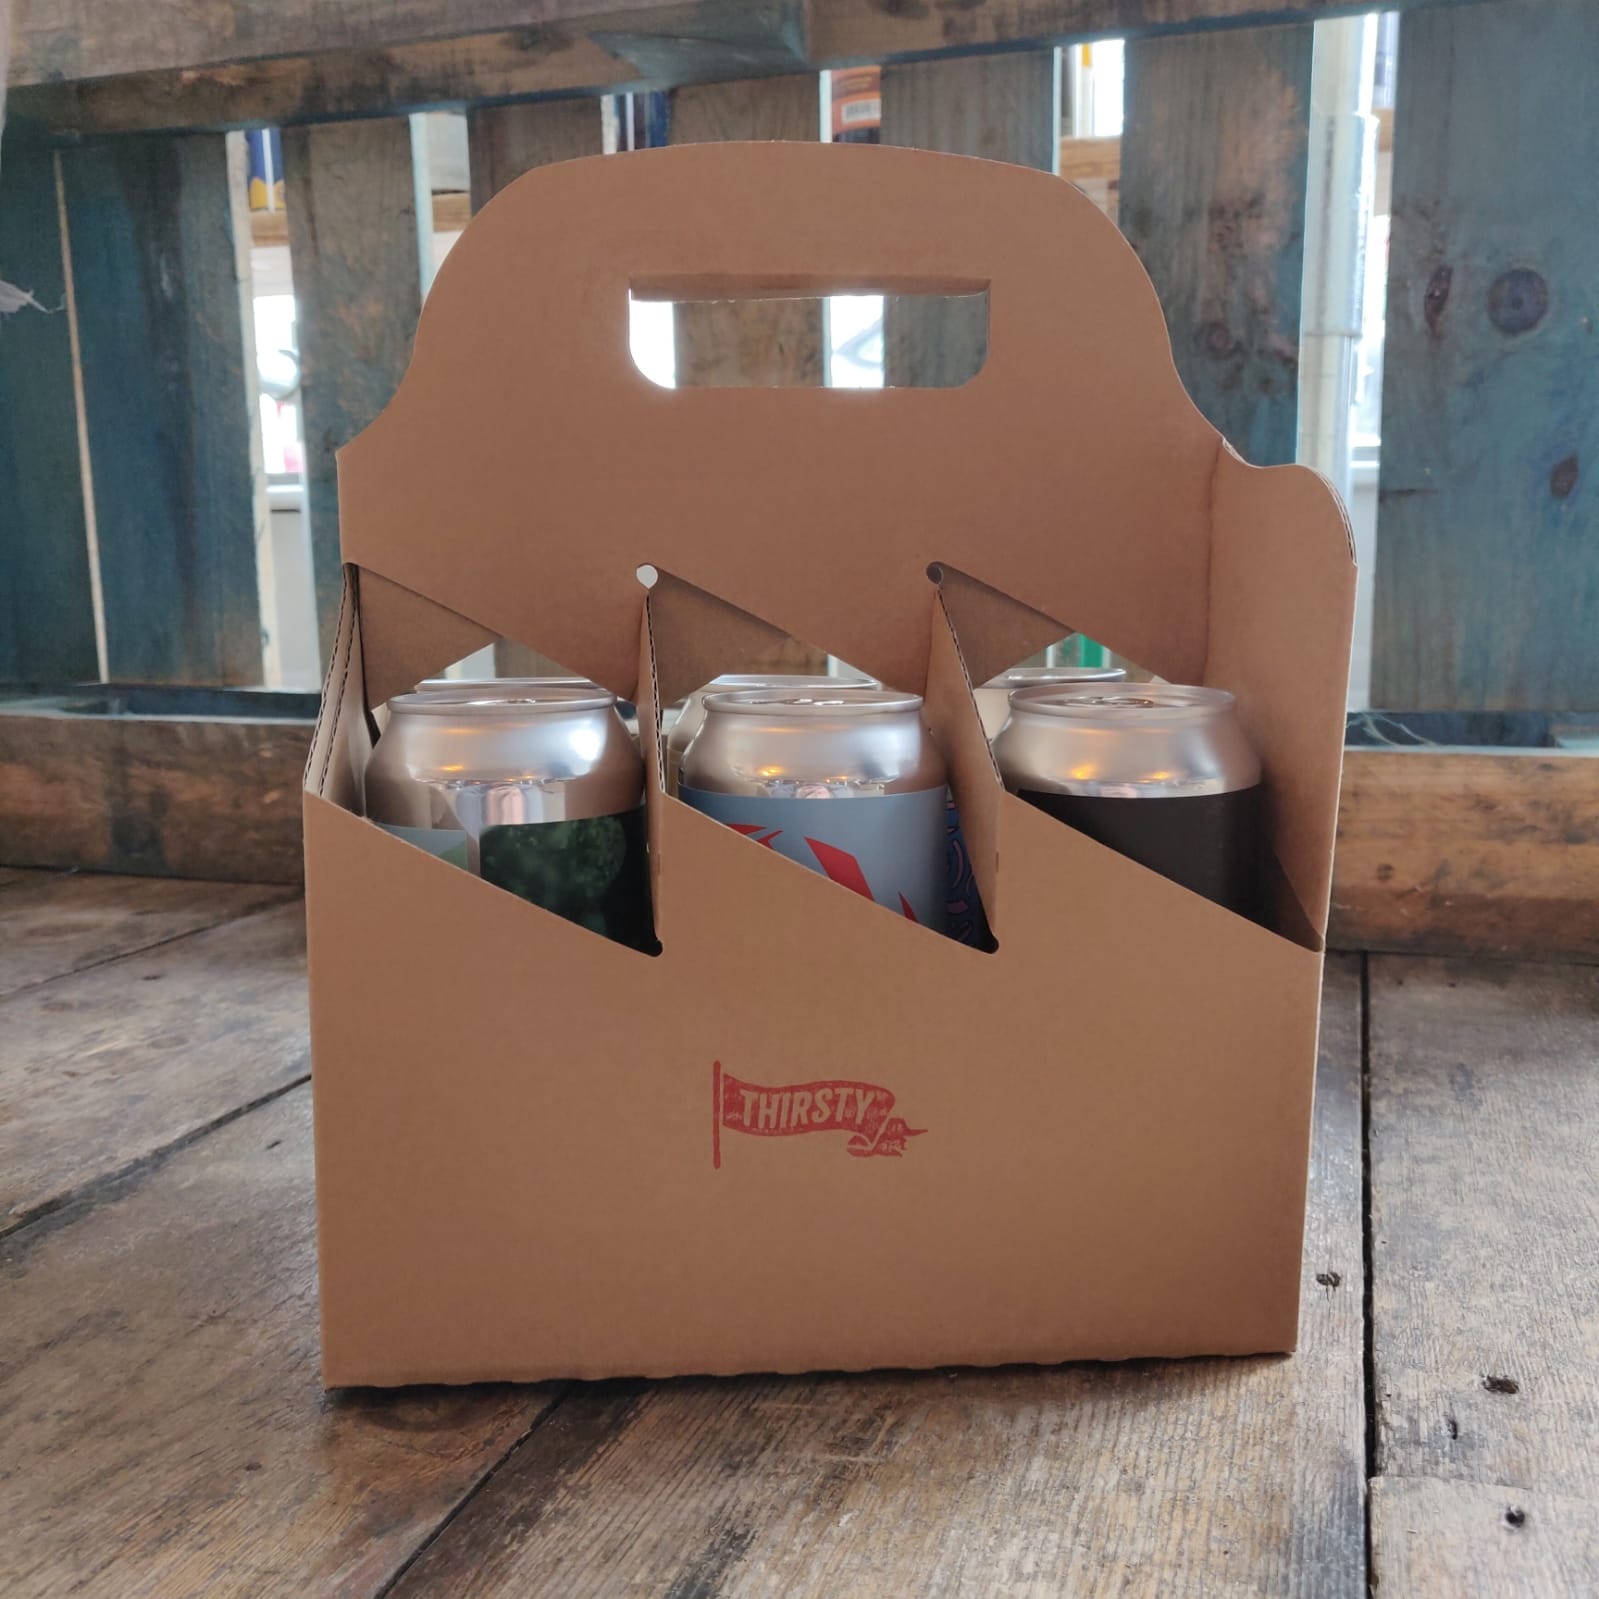 Thirsty Online Beer Festival | 'Hop Box' Version 2